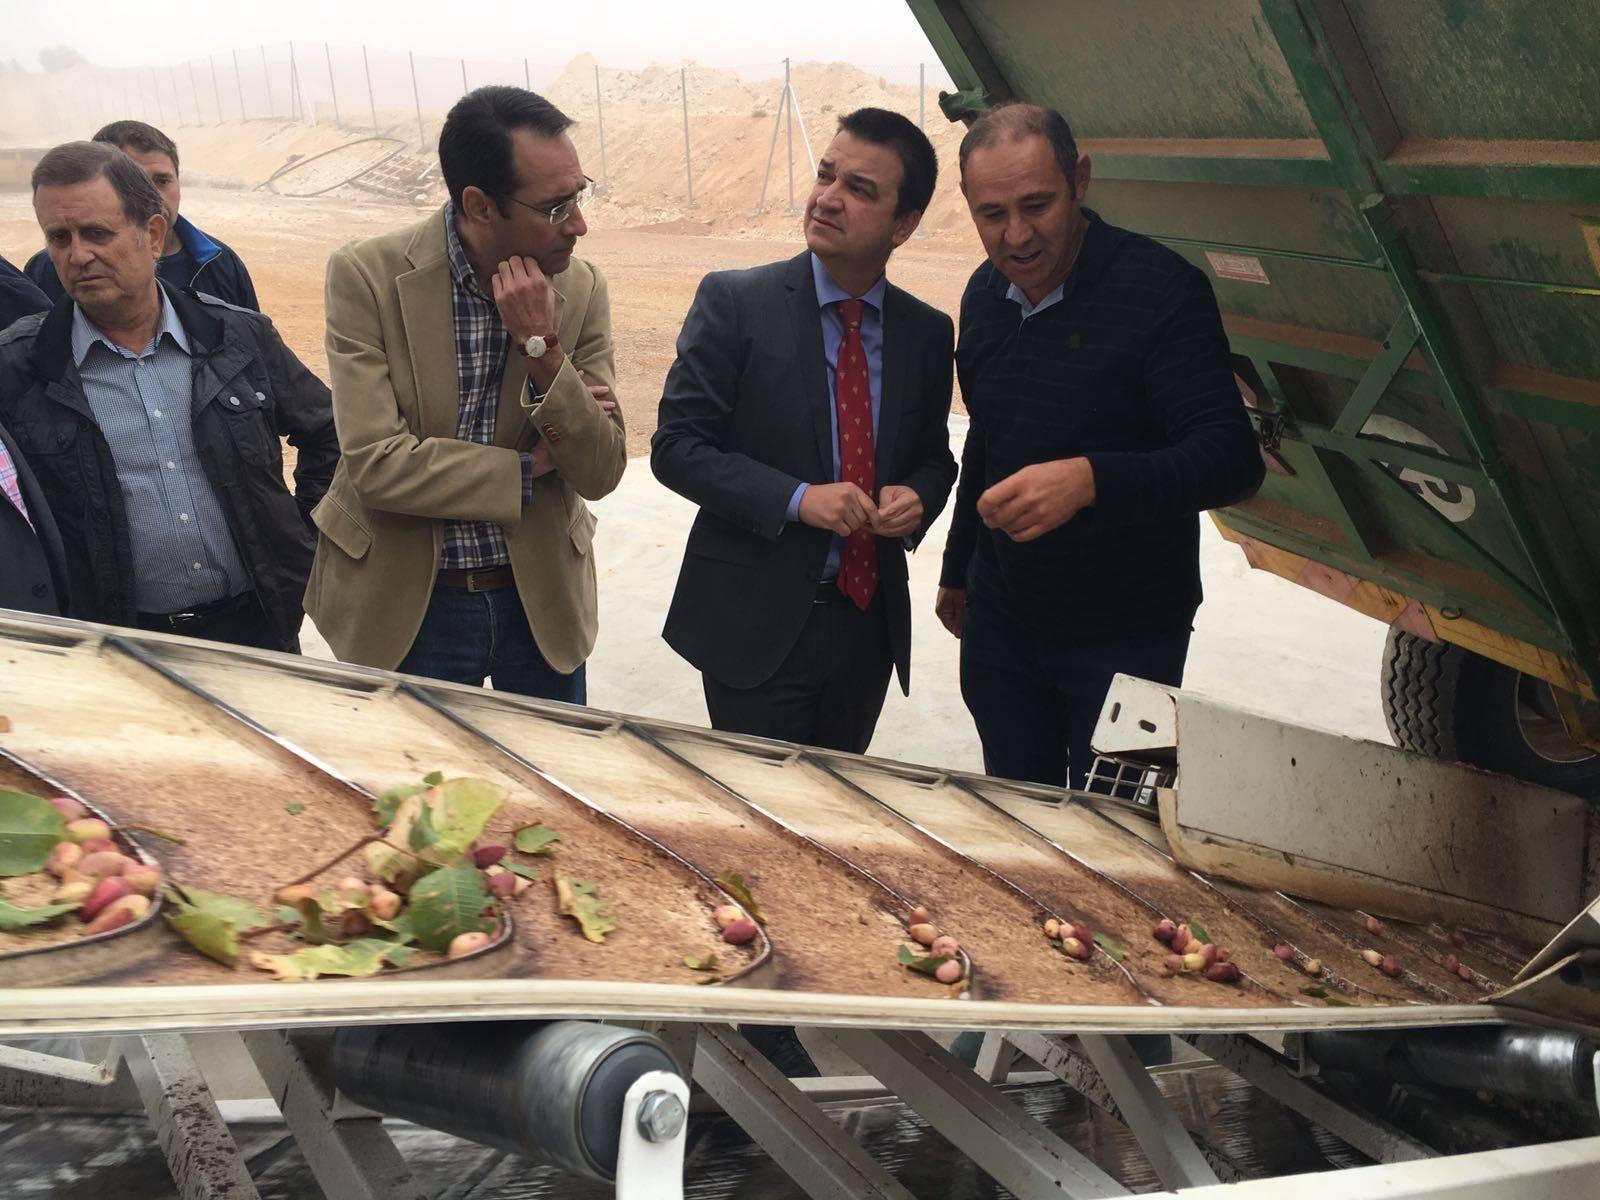 castilla la mancha referencia del pistacho mundial - La Mancha quiere ser una referencia del pistacho a nivel europeo